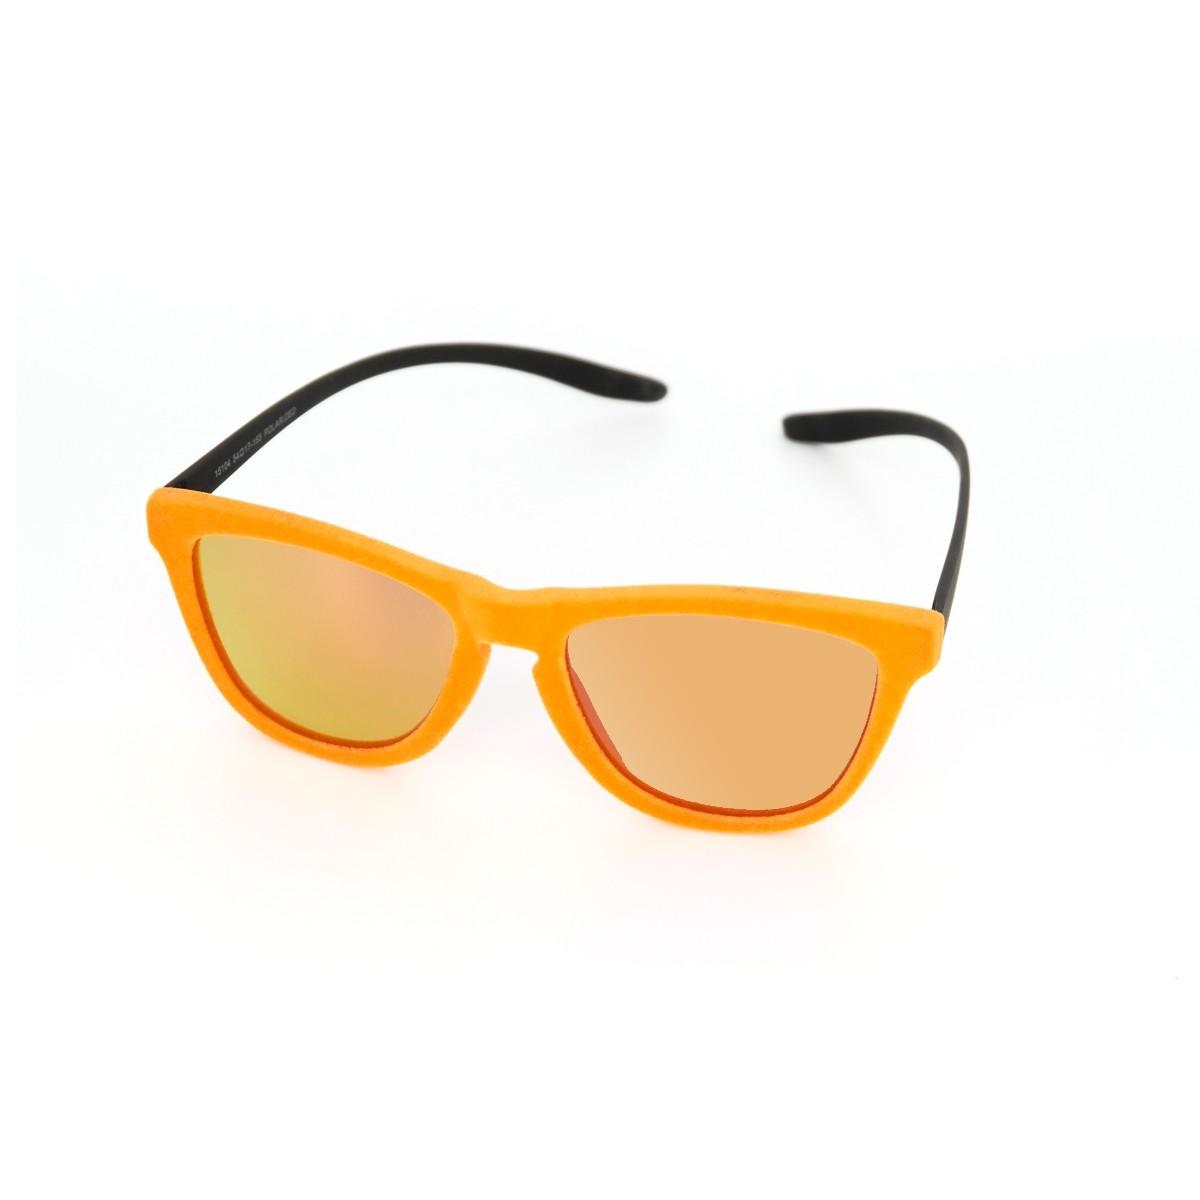 Centrostyle Koala 15104, 48,00€, Occhiali Centrostyle Arancio a forma Squadrato